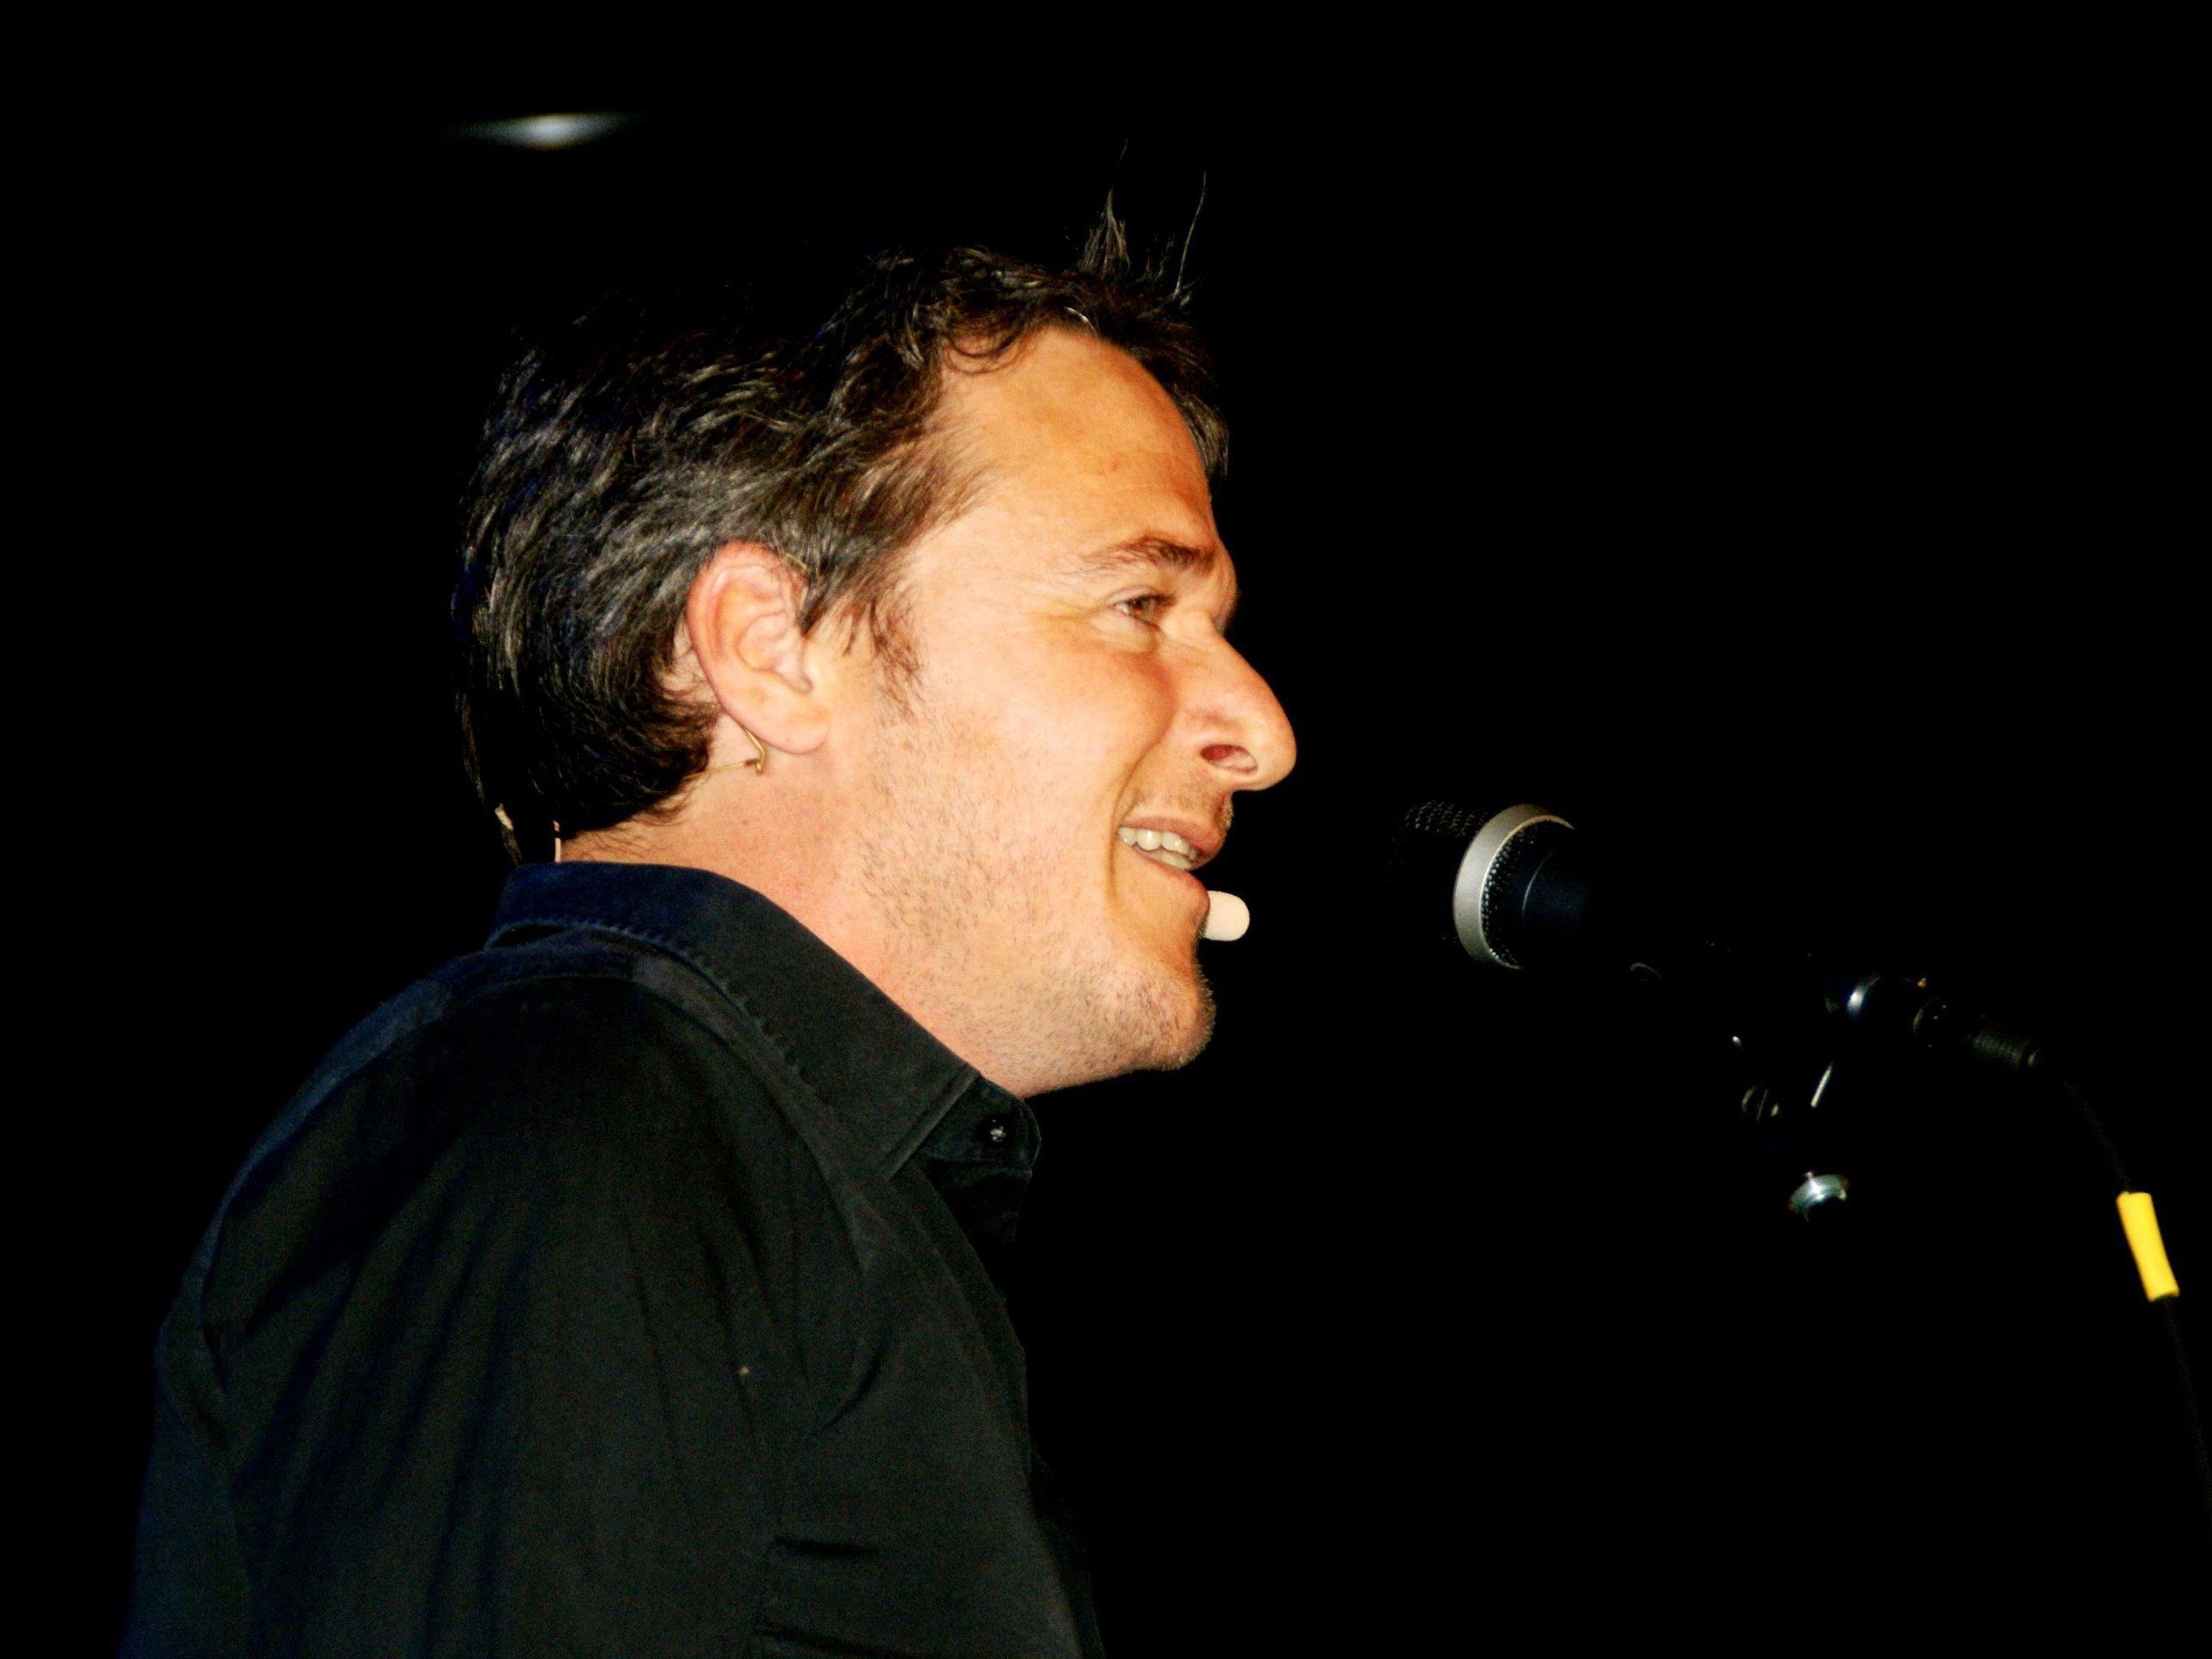 Christof Spörk unterhielt das Publikum im KOM